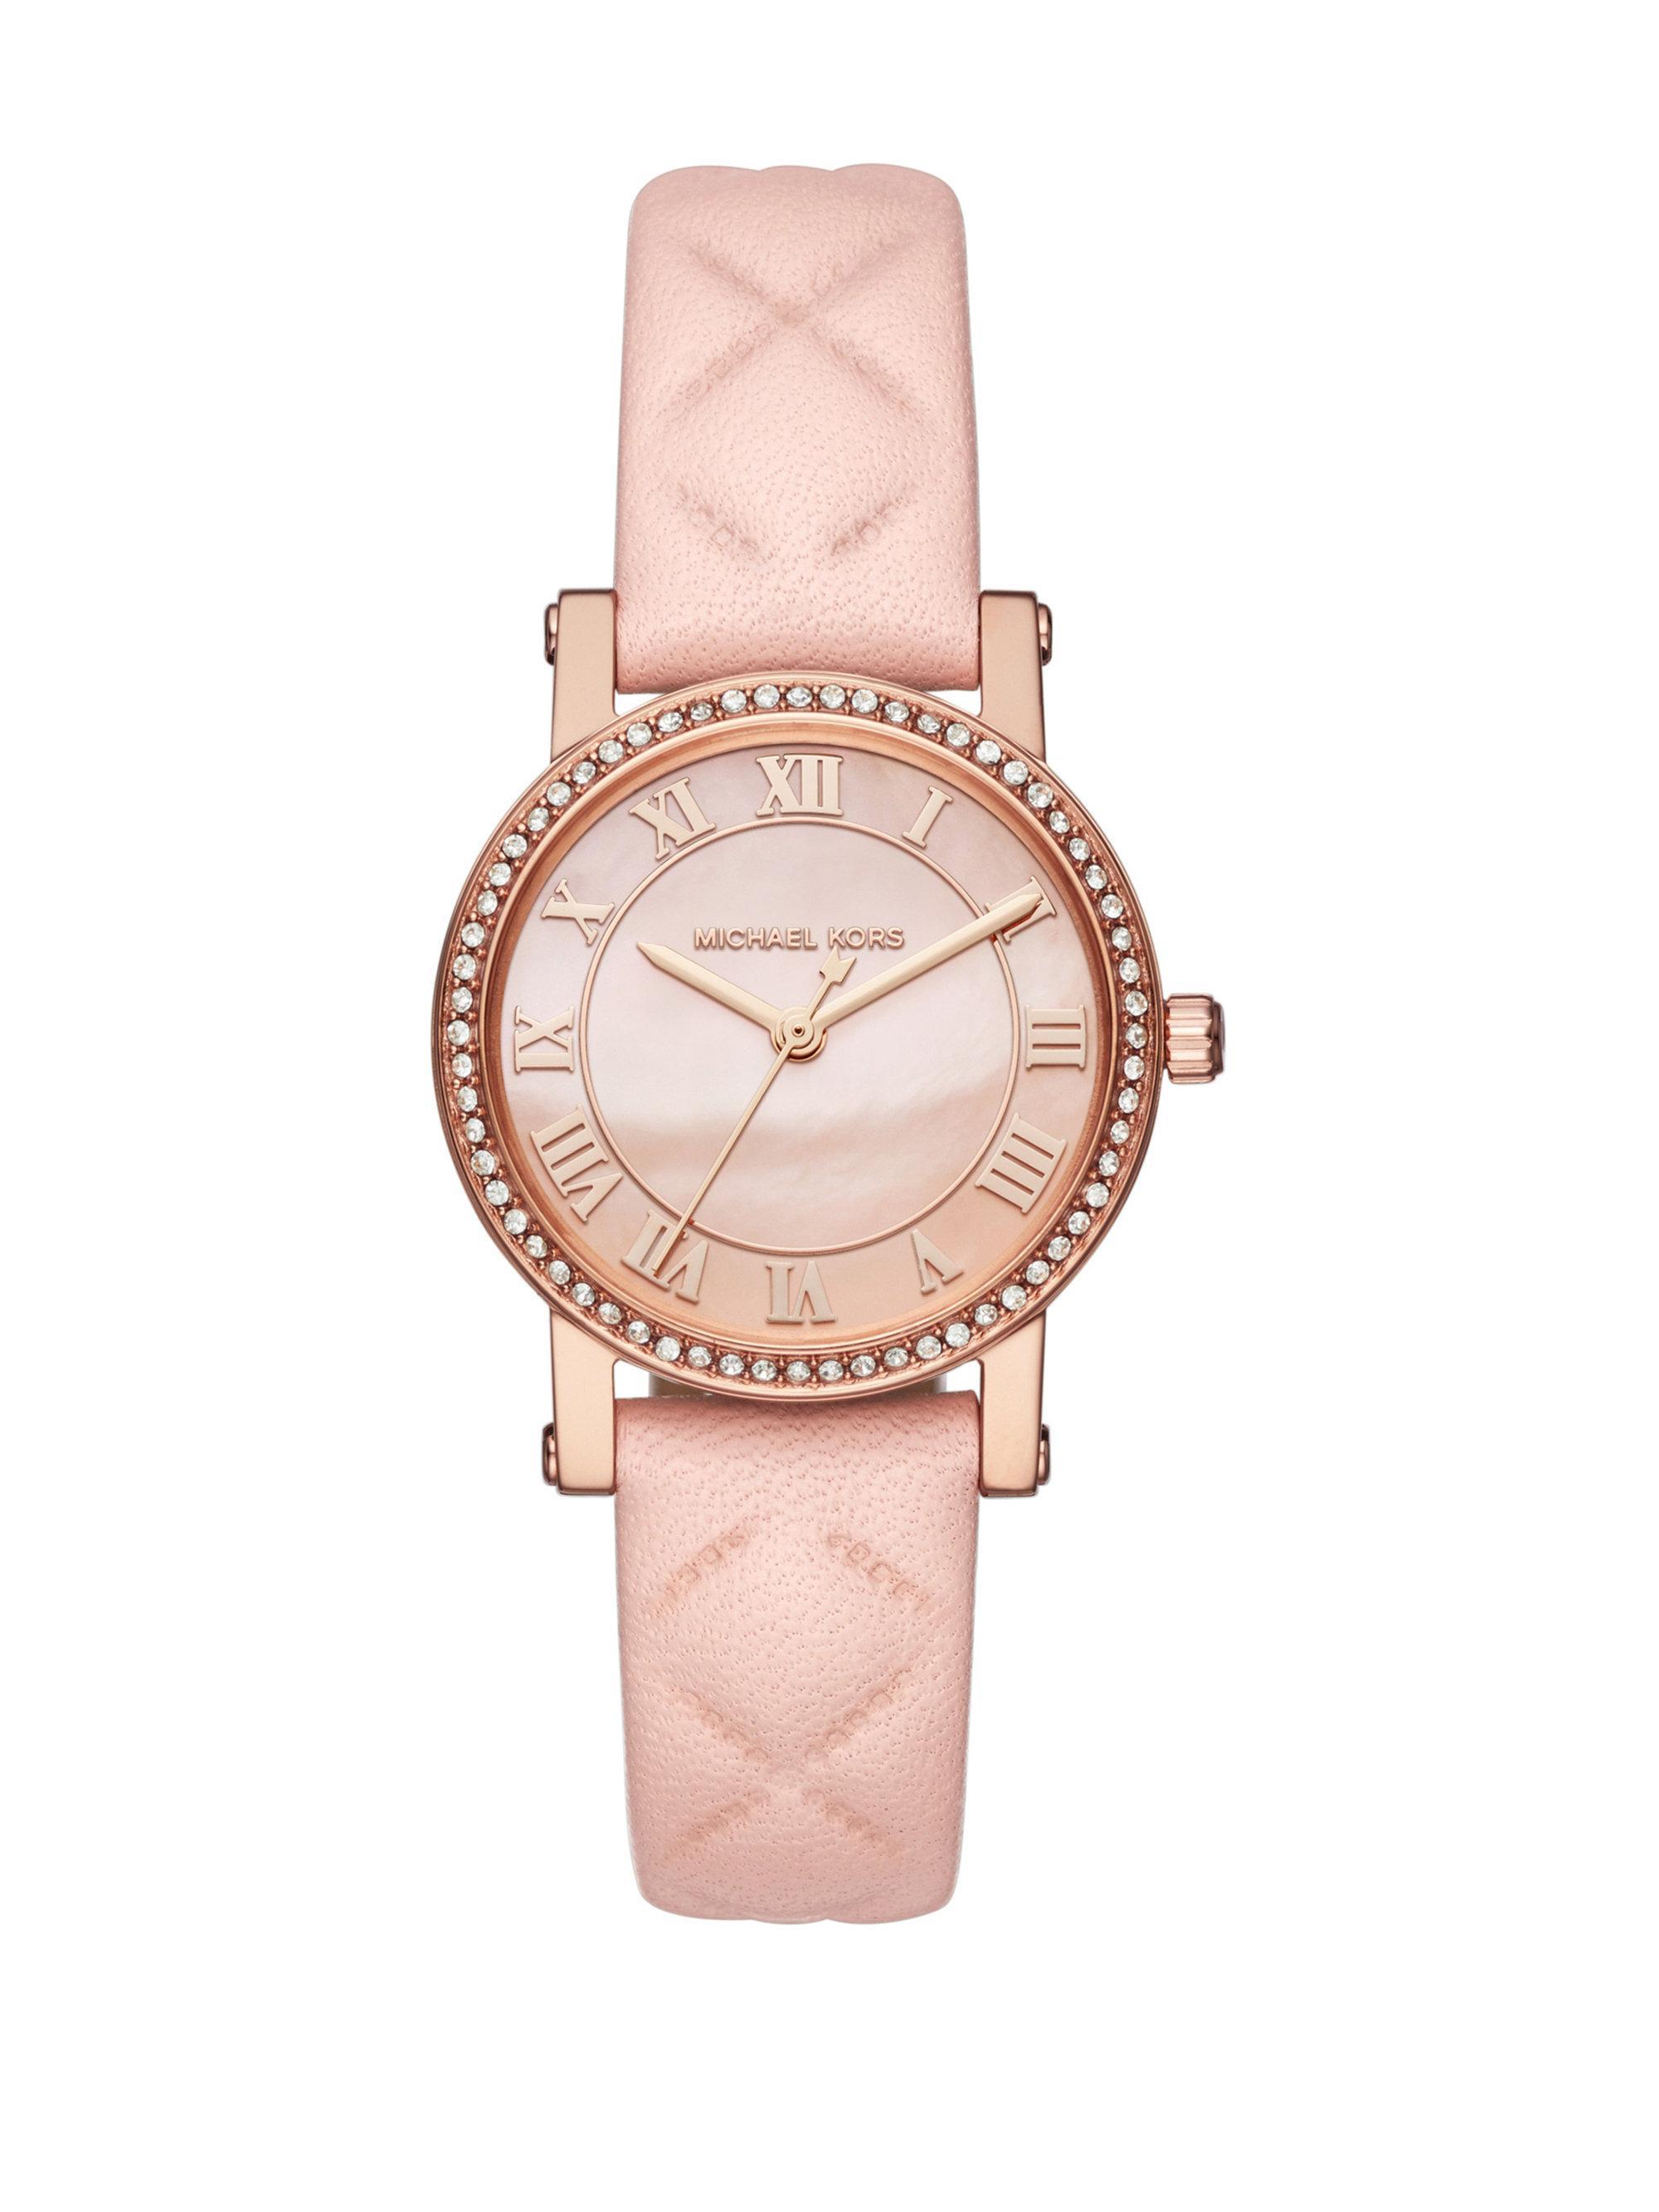 748fd038d04e Michael Kors - Multicolor Petite Norie Leather Strap Watch - Lyst. View  fullscreen